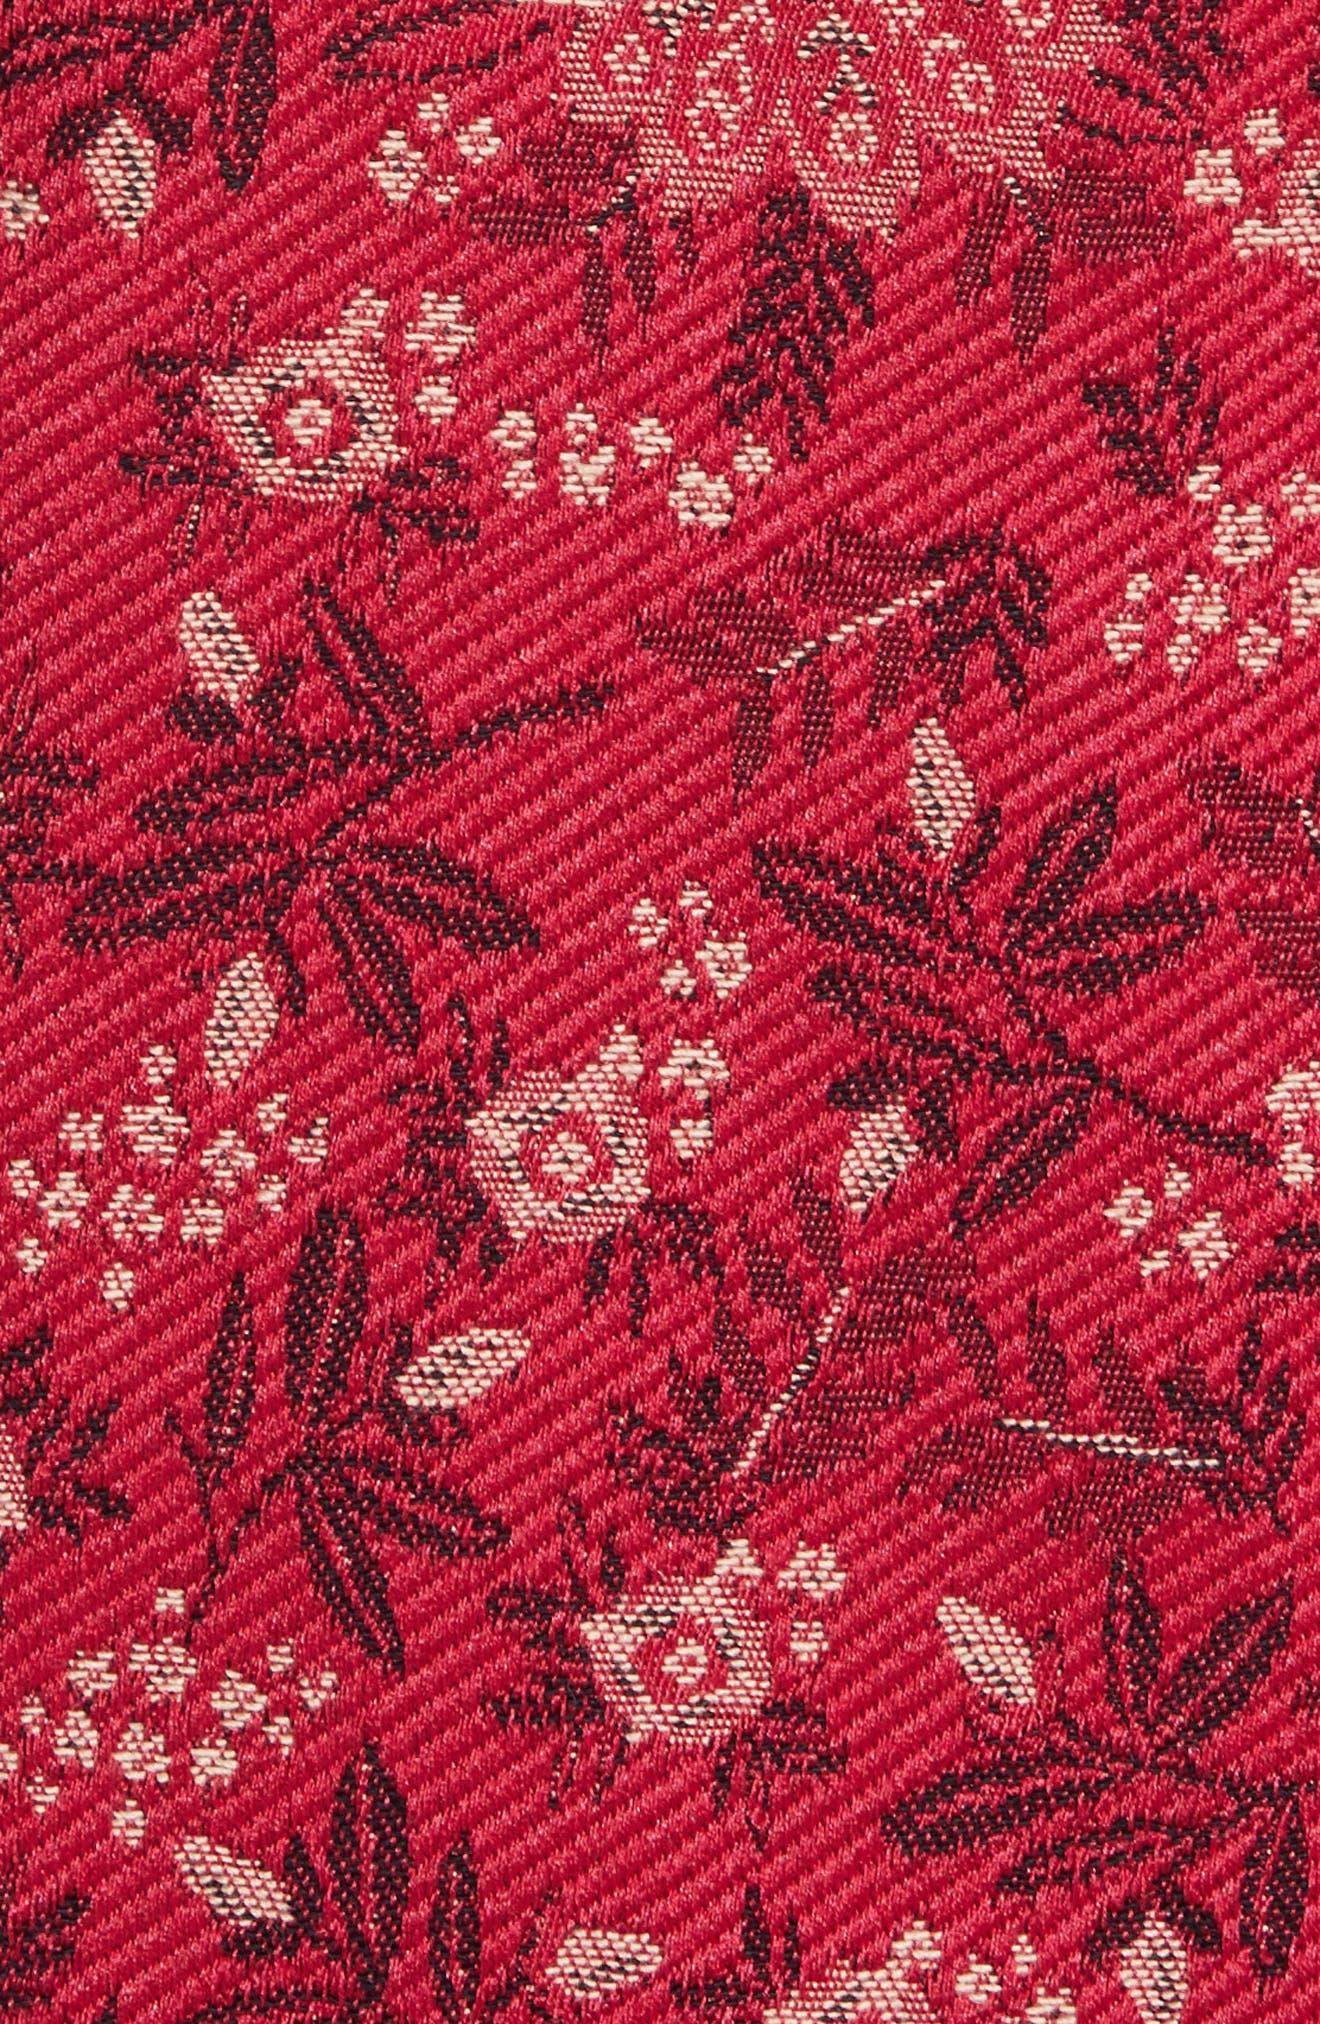 Marylou Floral Jacquard Sweatshirt,                             Alternate thumbnail 5, color,                             650